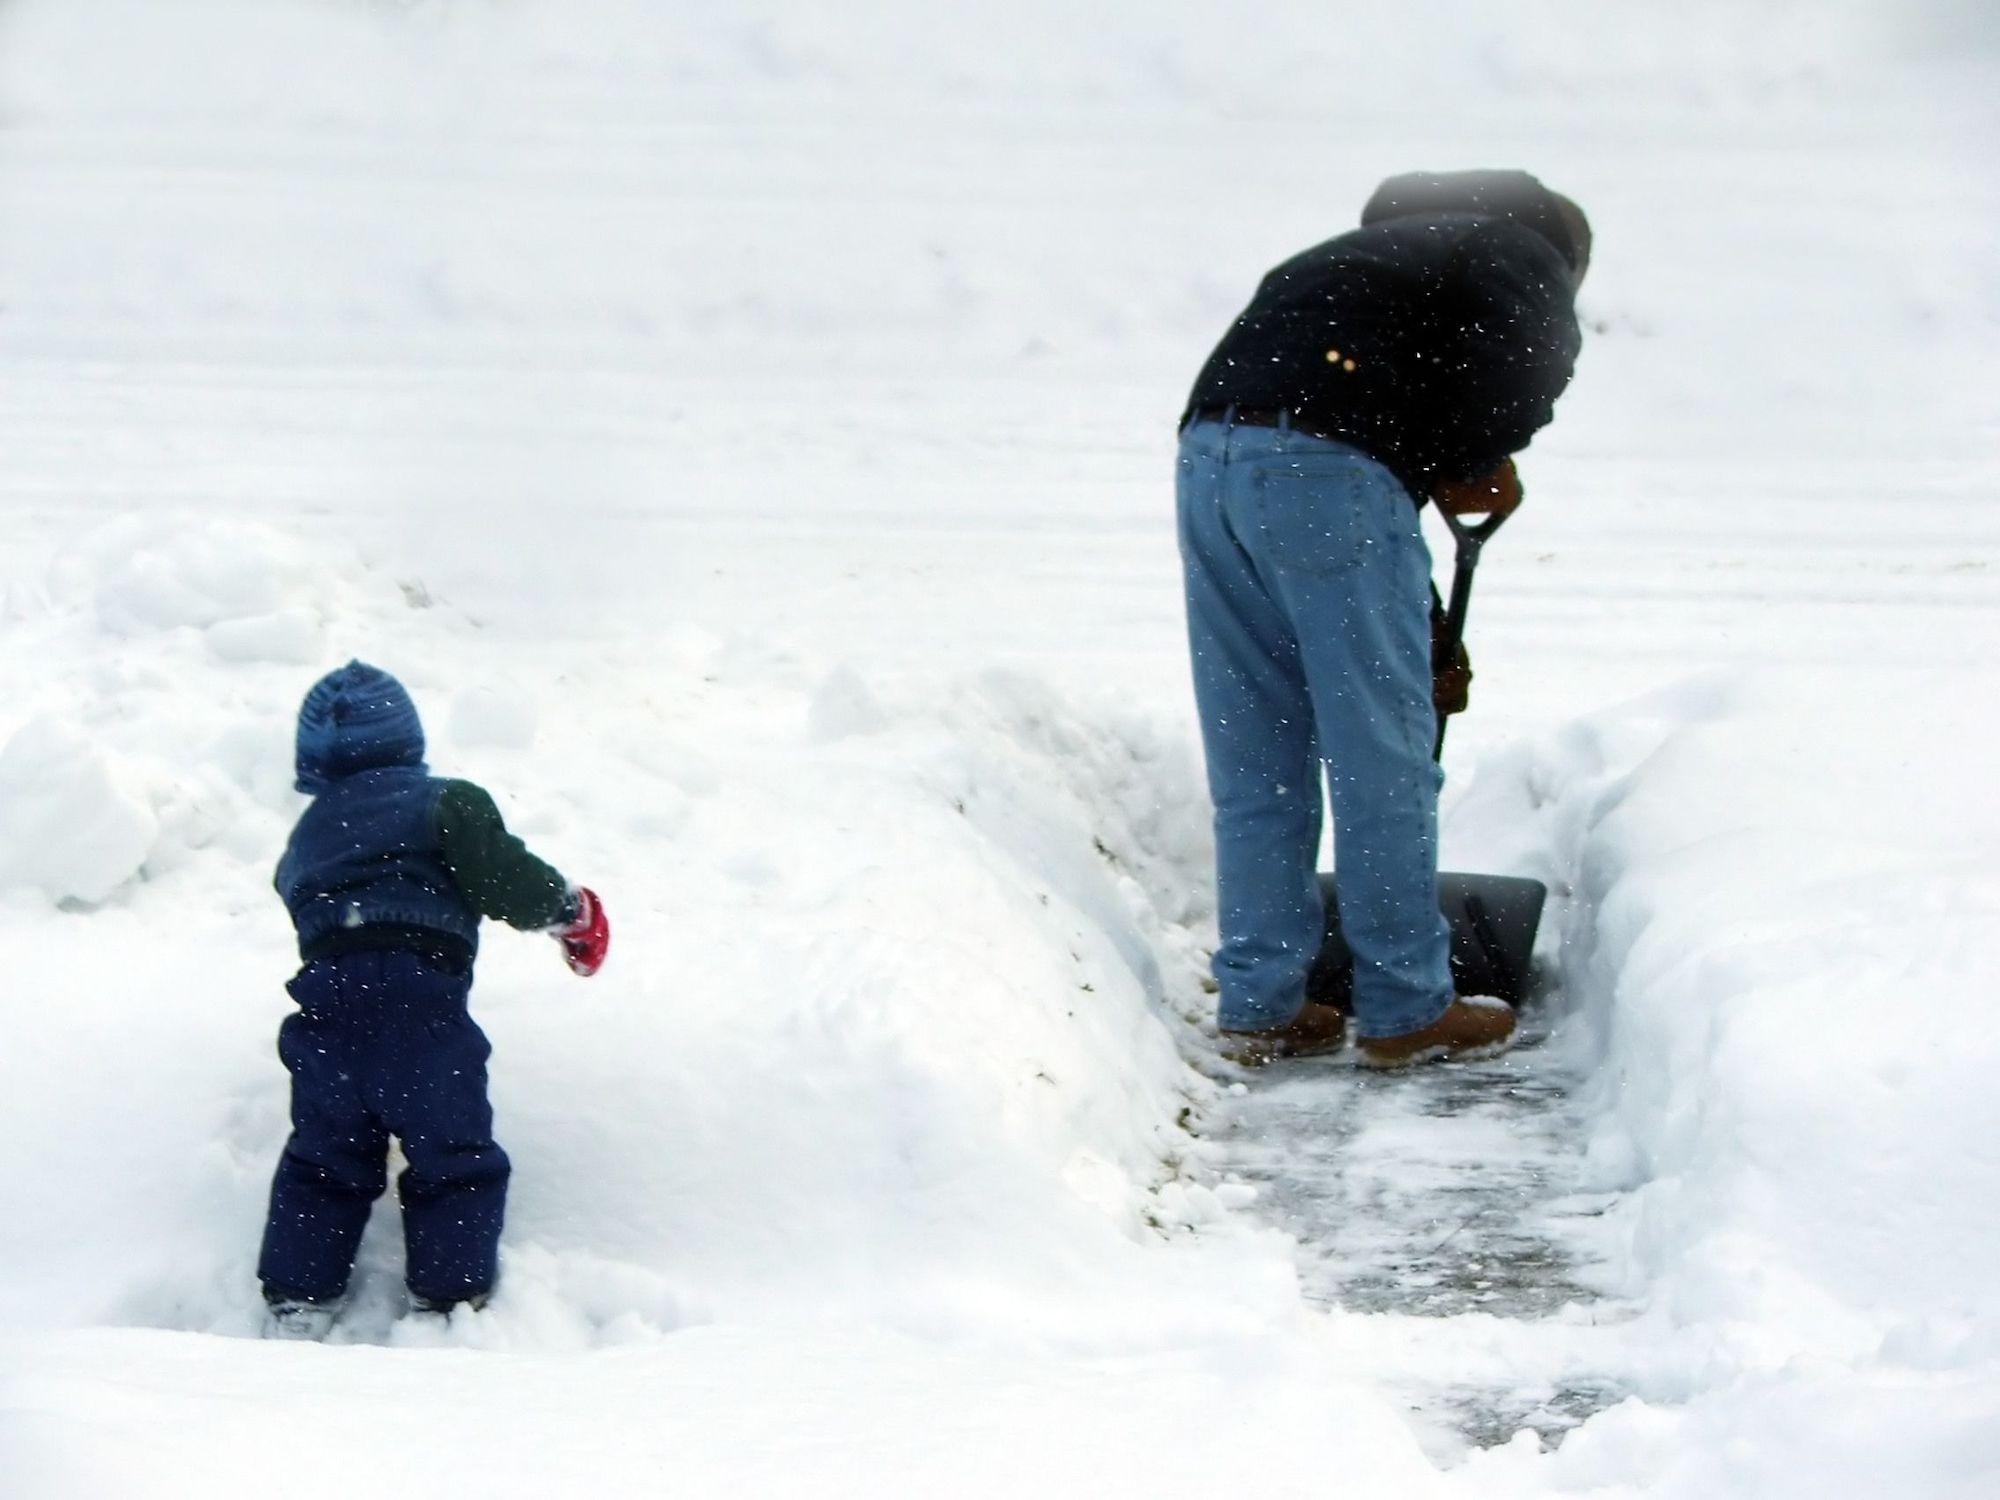 Werken in sneeuw